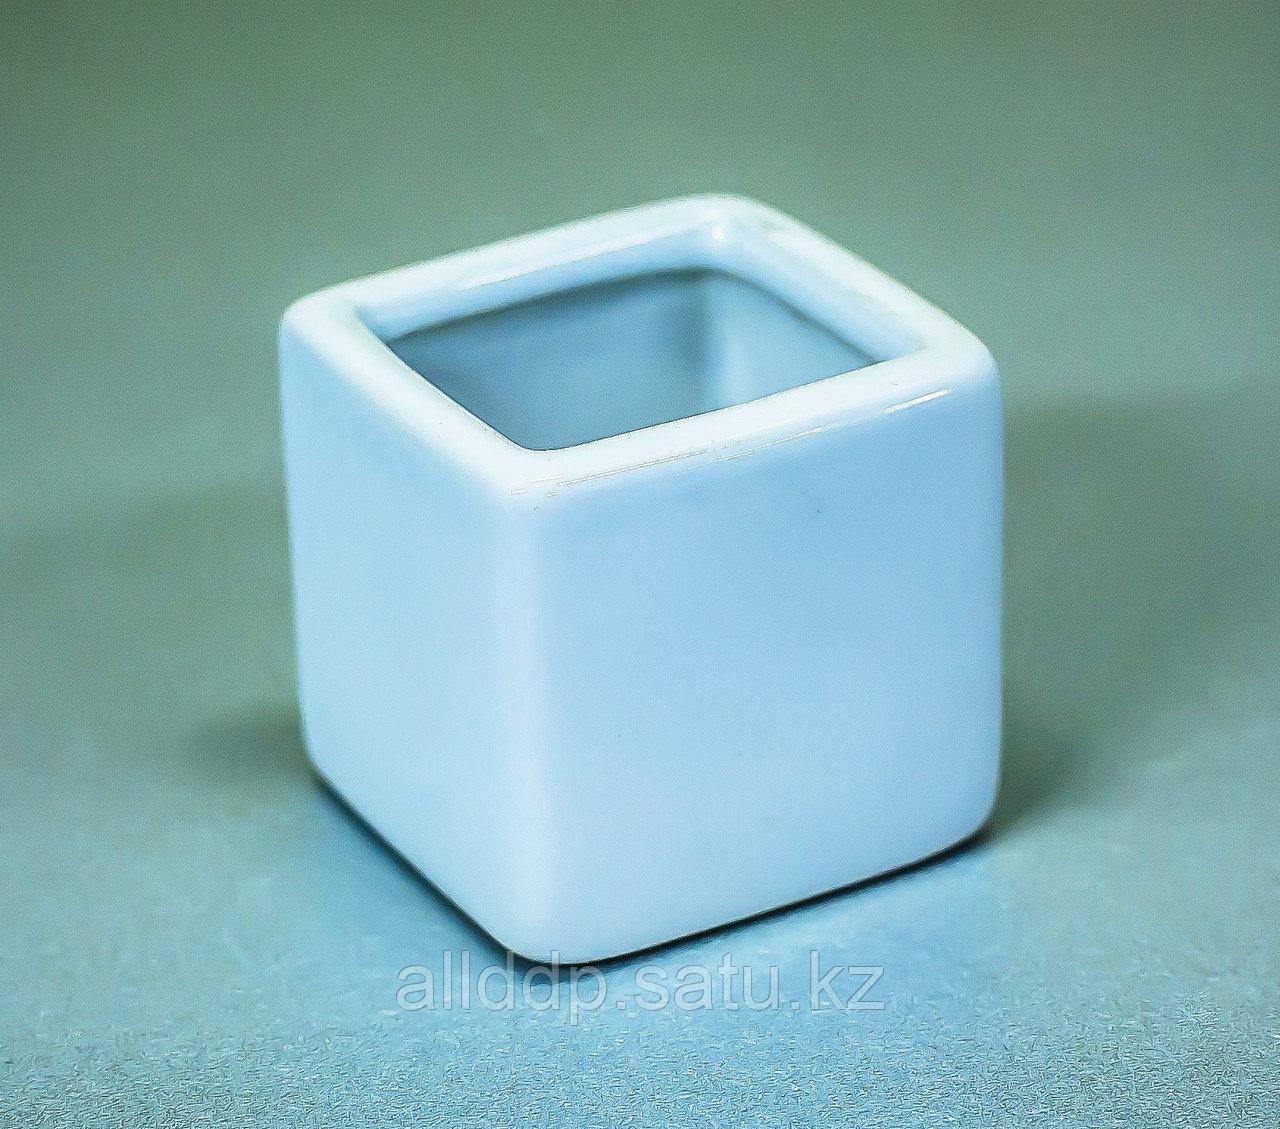 "Чаша декоративная ""Квадратная"" (керамика, белая),5х5см"